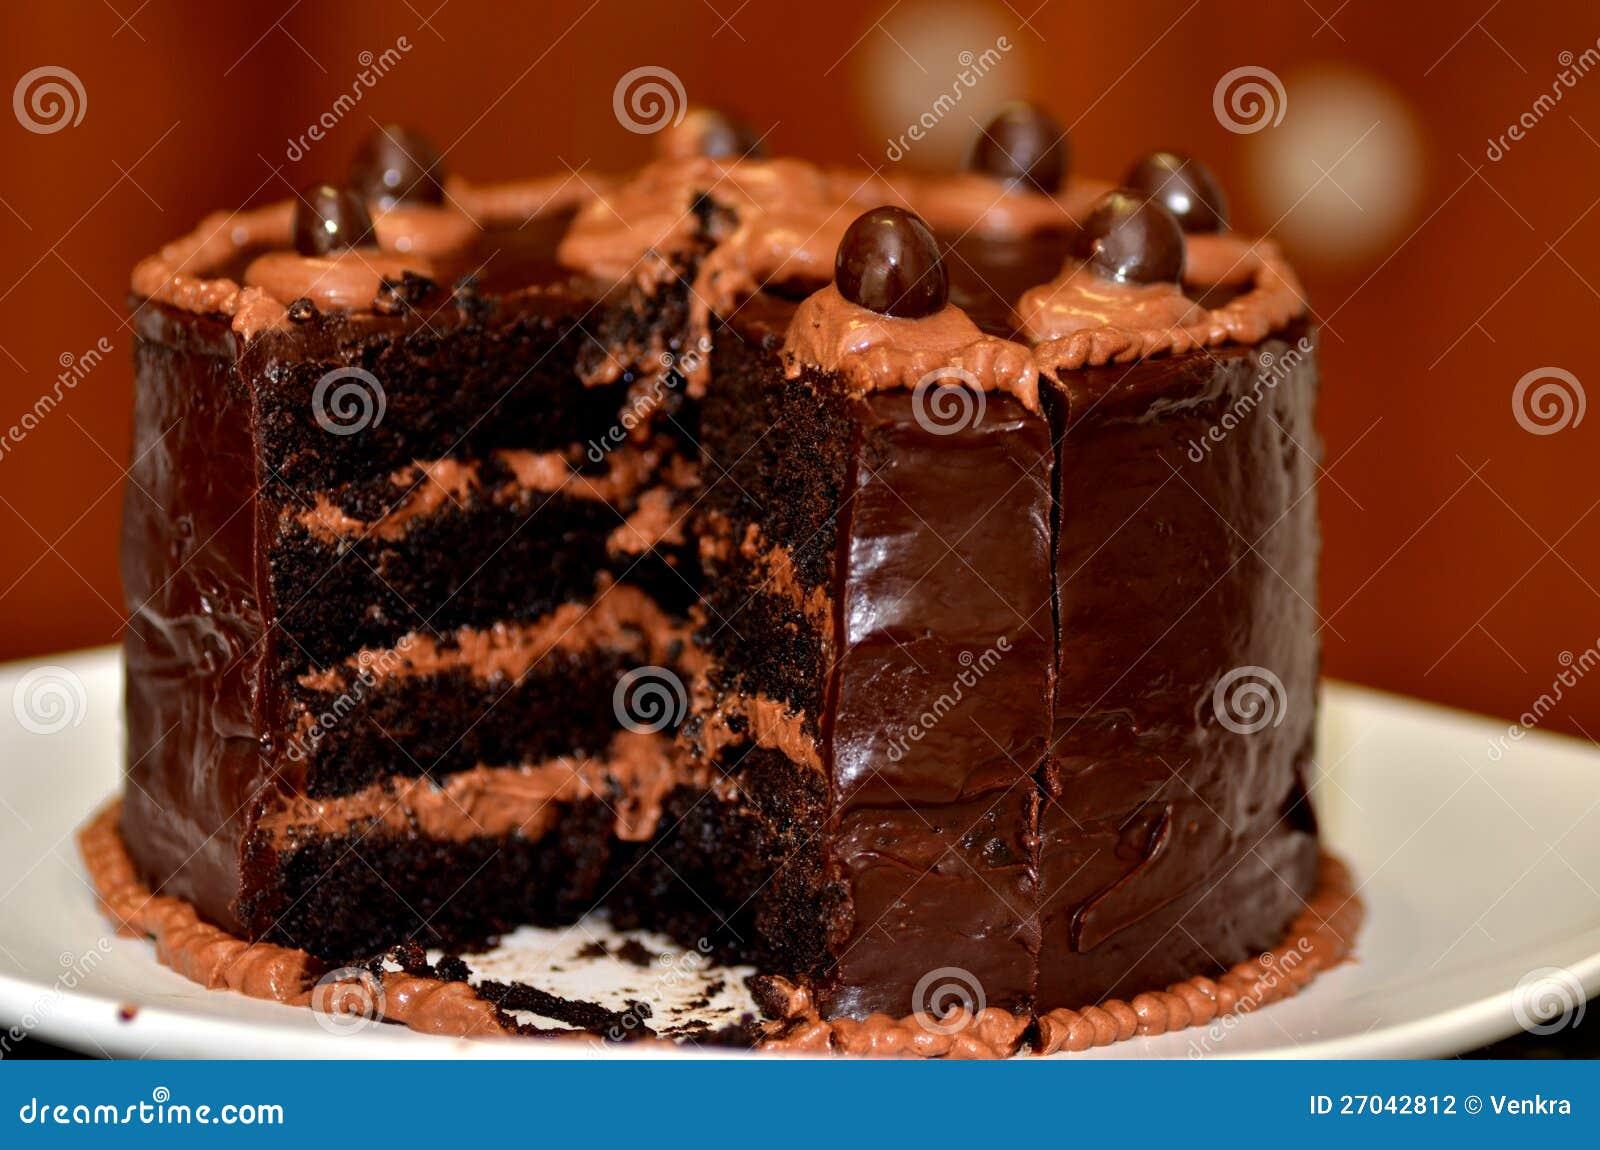 Dark Chocolate Cake Stock Photography - Image: 27042812